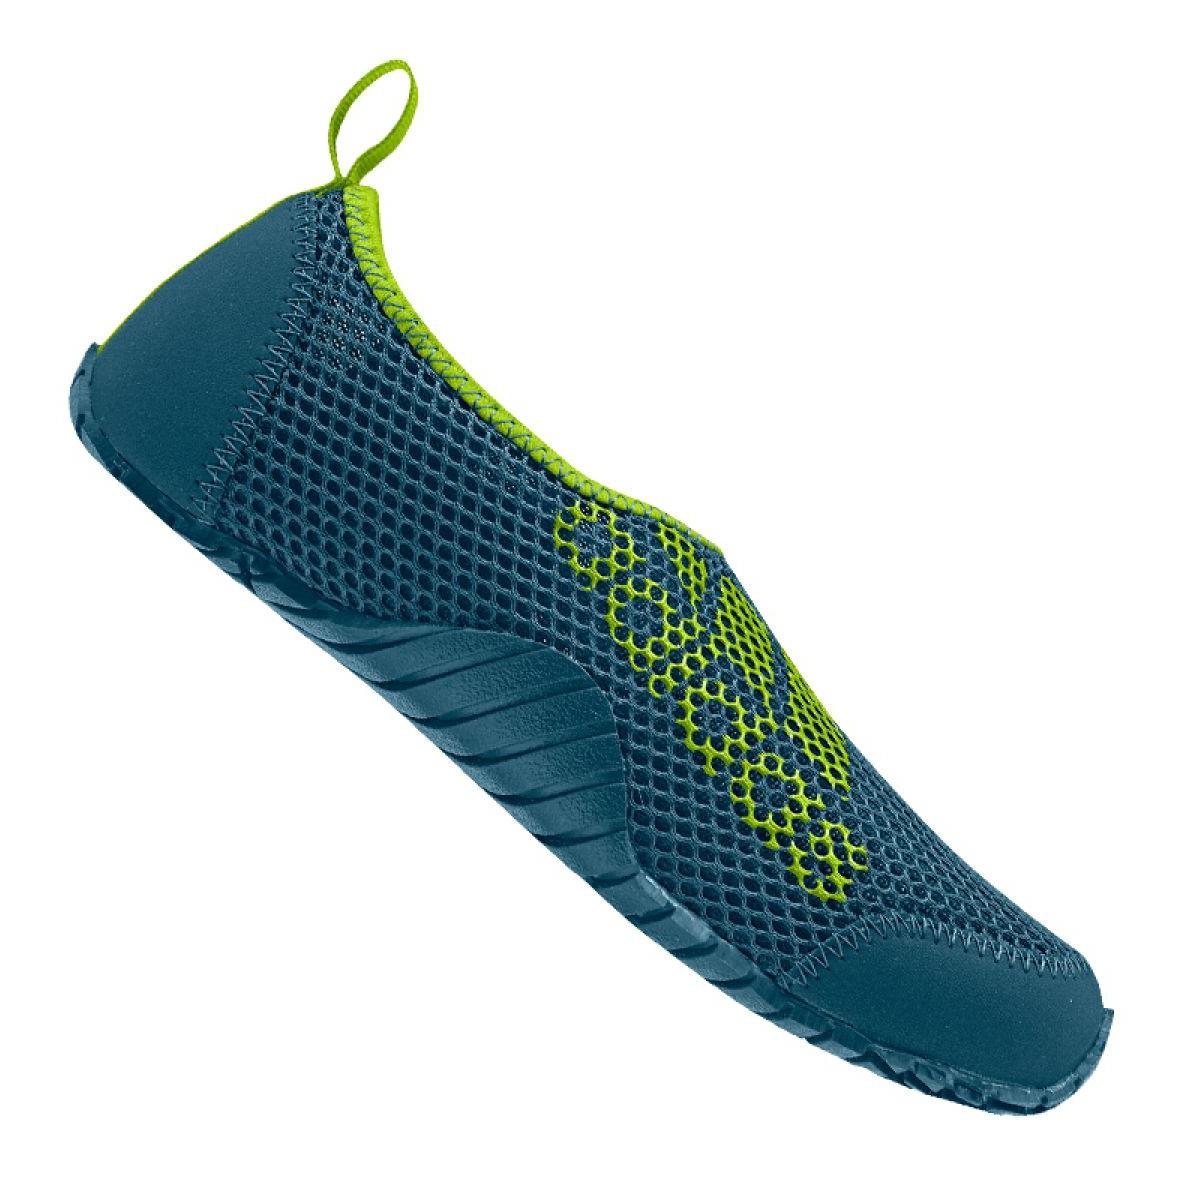 Adidas Kurobe K Jr CM7644 water shoes